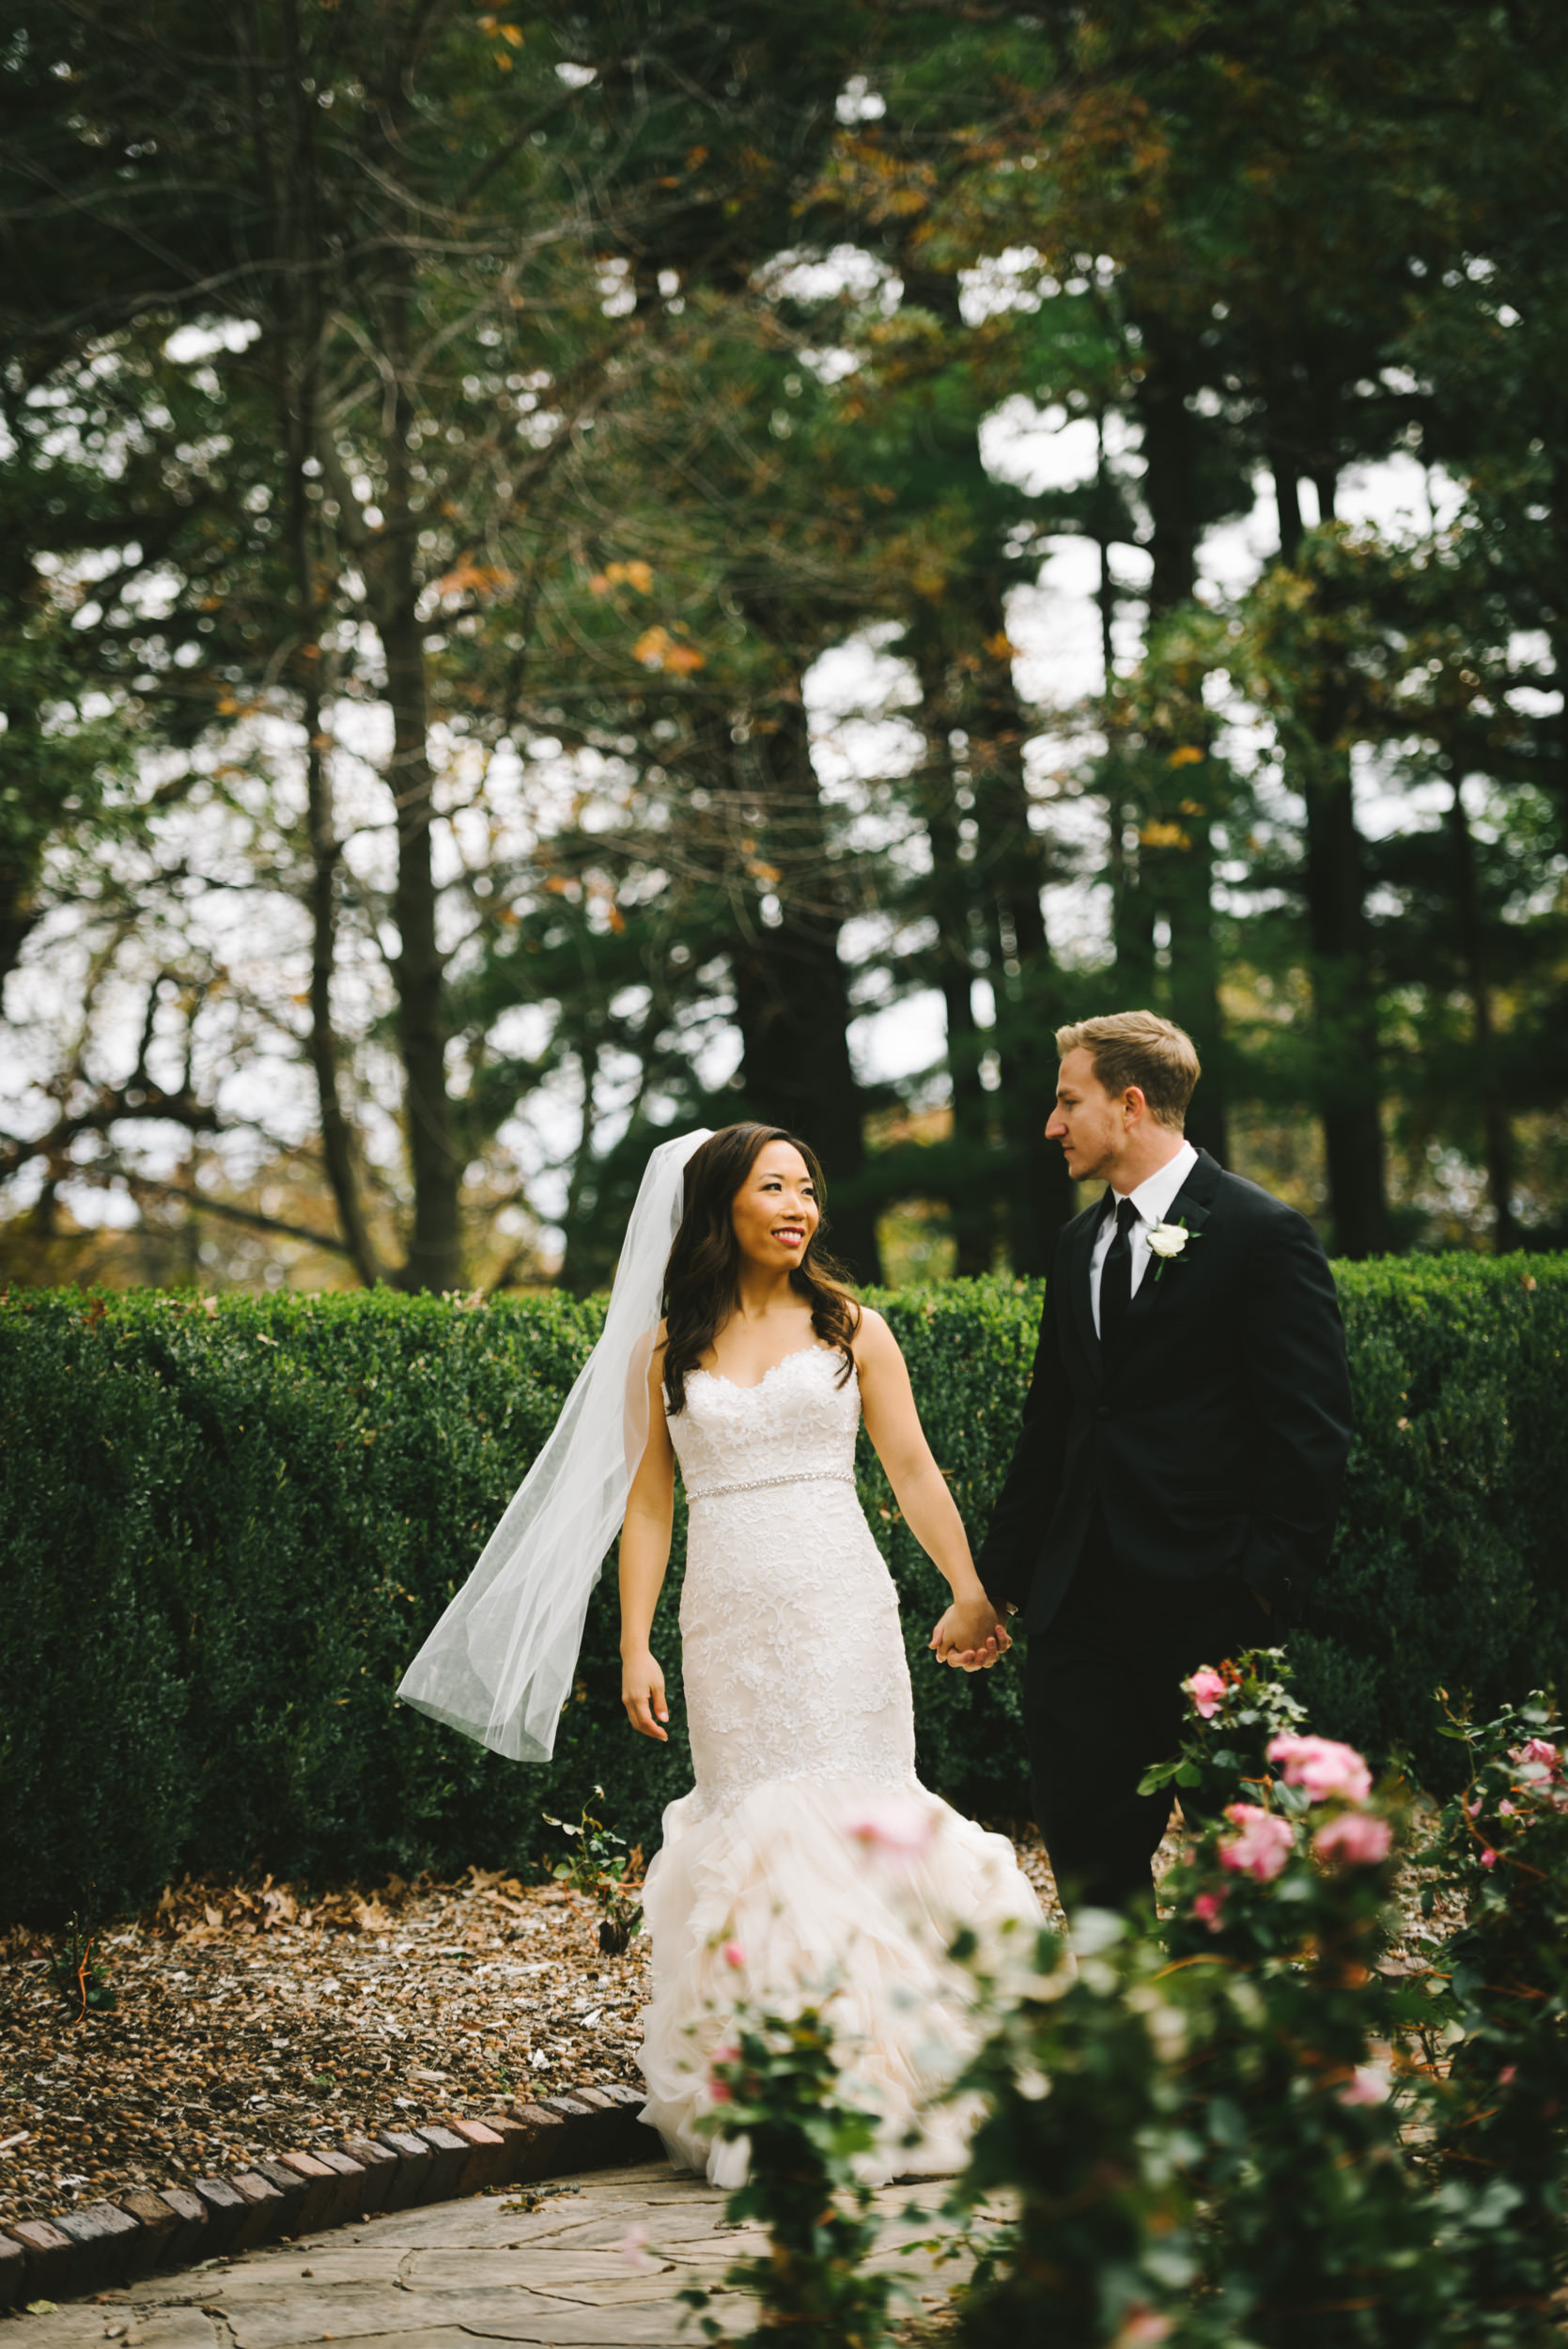 20171029_Wedding-Kristin-Garrett-182.jpg